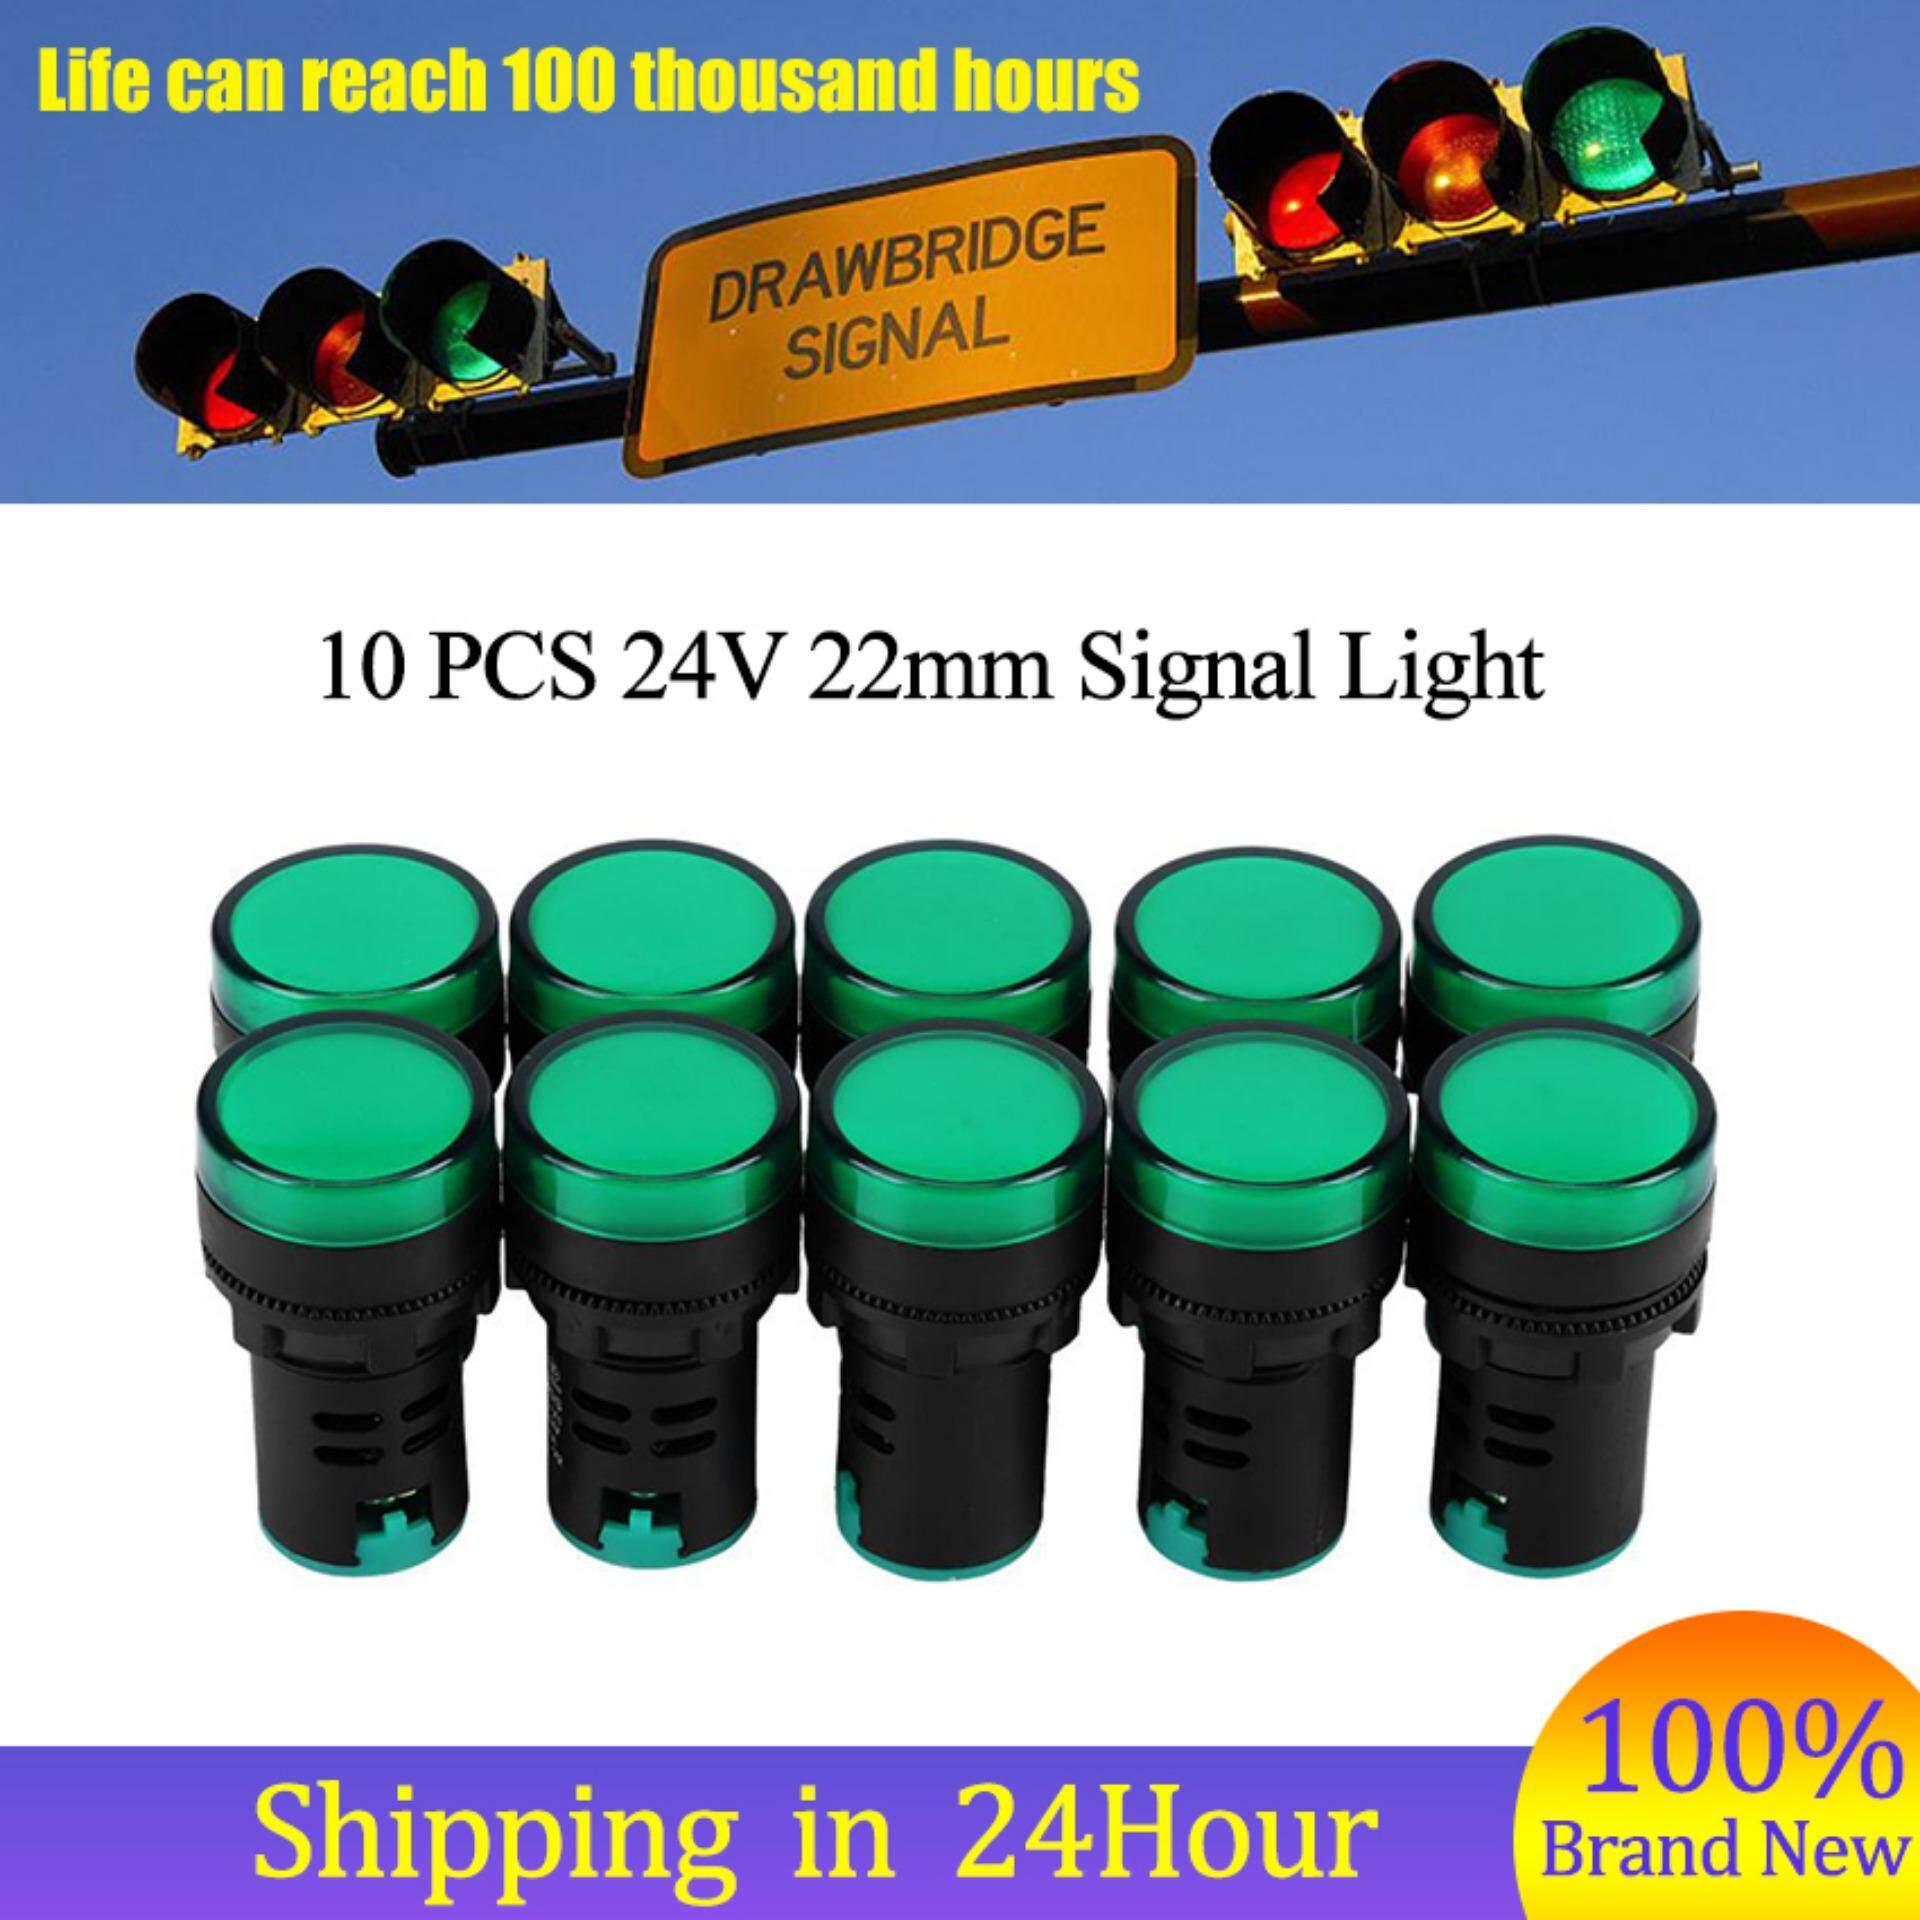 Signal Light 10Pcs AC/DC 24V 22mm Thread LED Electronic Indicator Signal Light (Green)